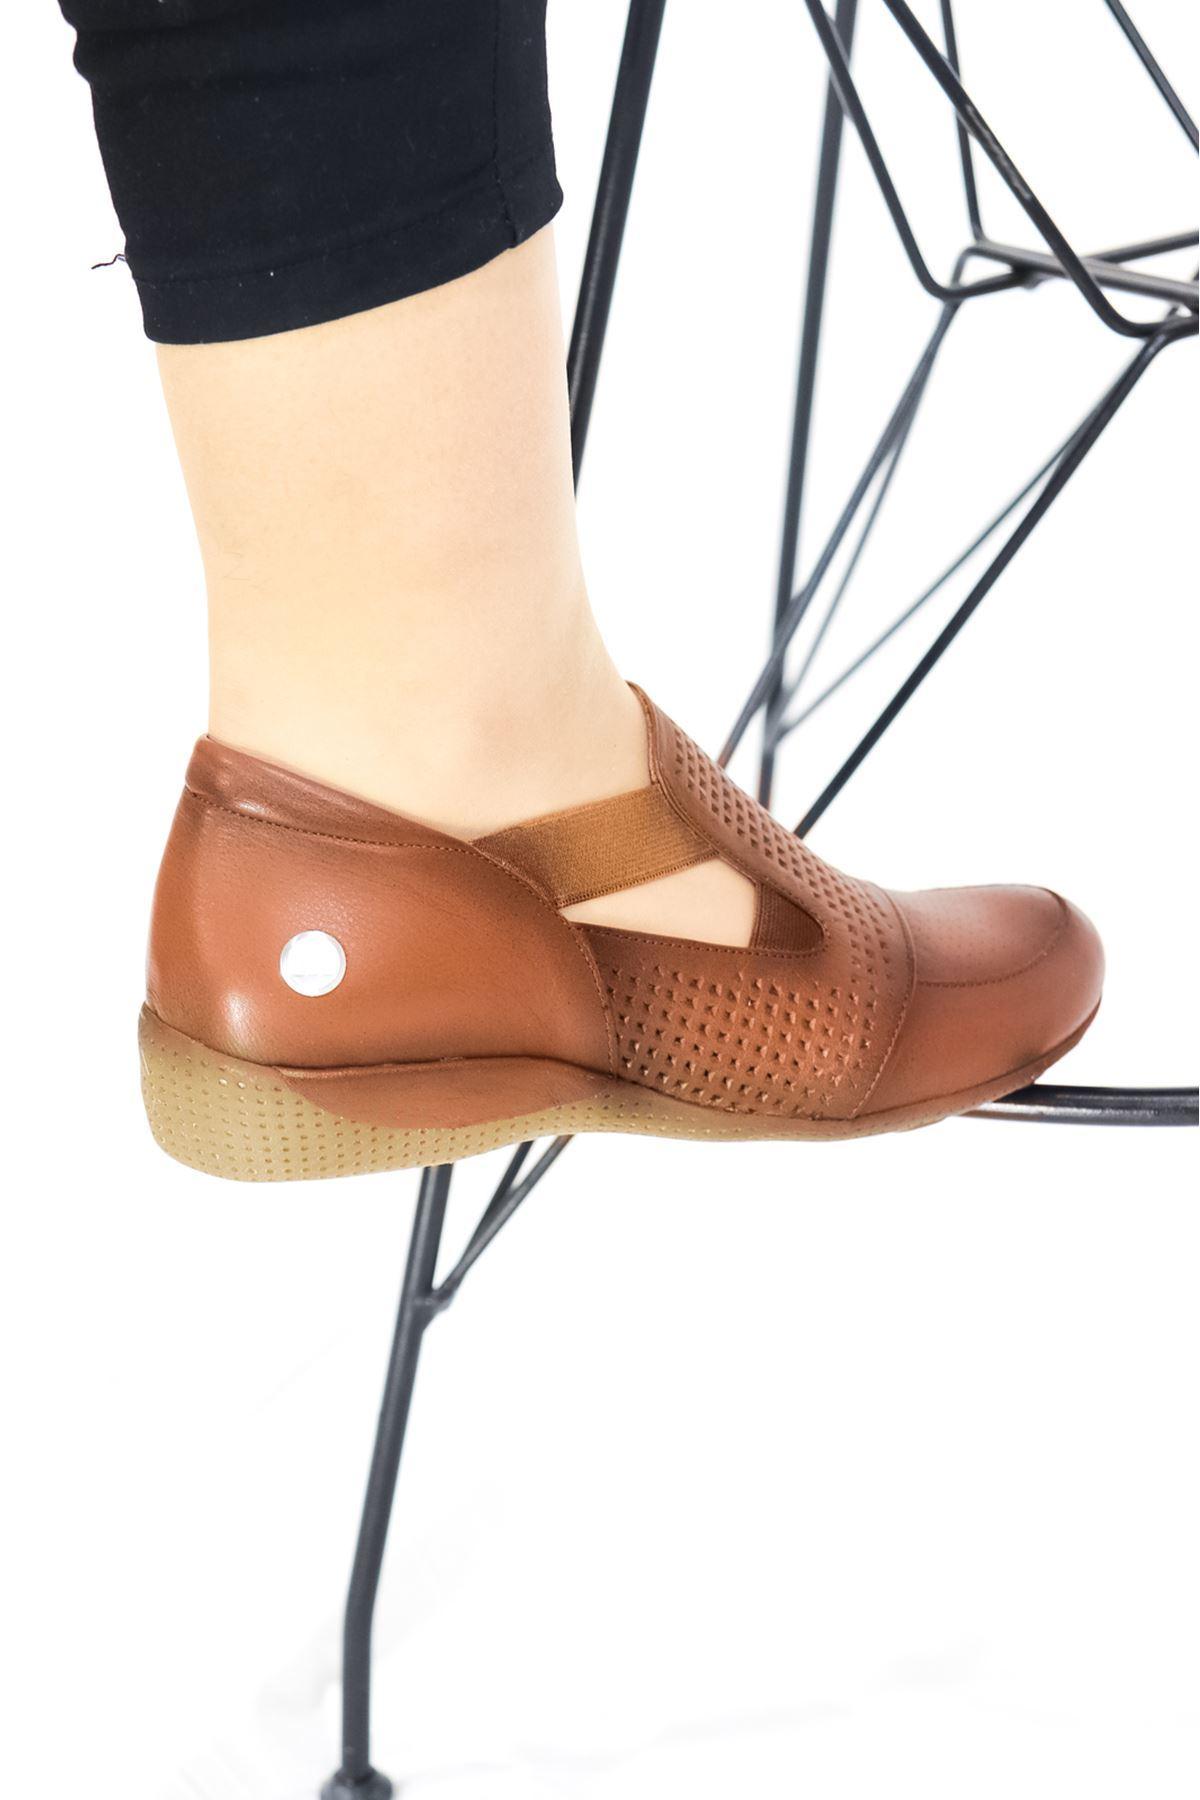 Mammamia - D21YA - 3055-B Taba Kadın Ayakkabısı